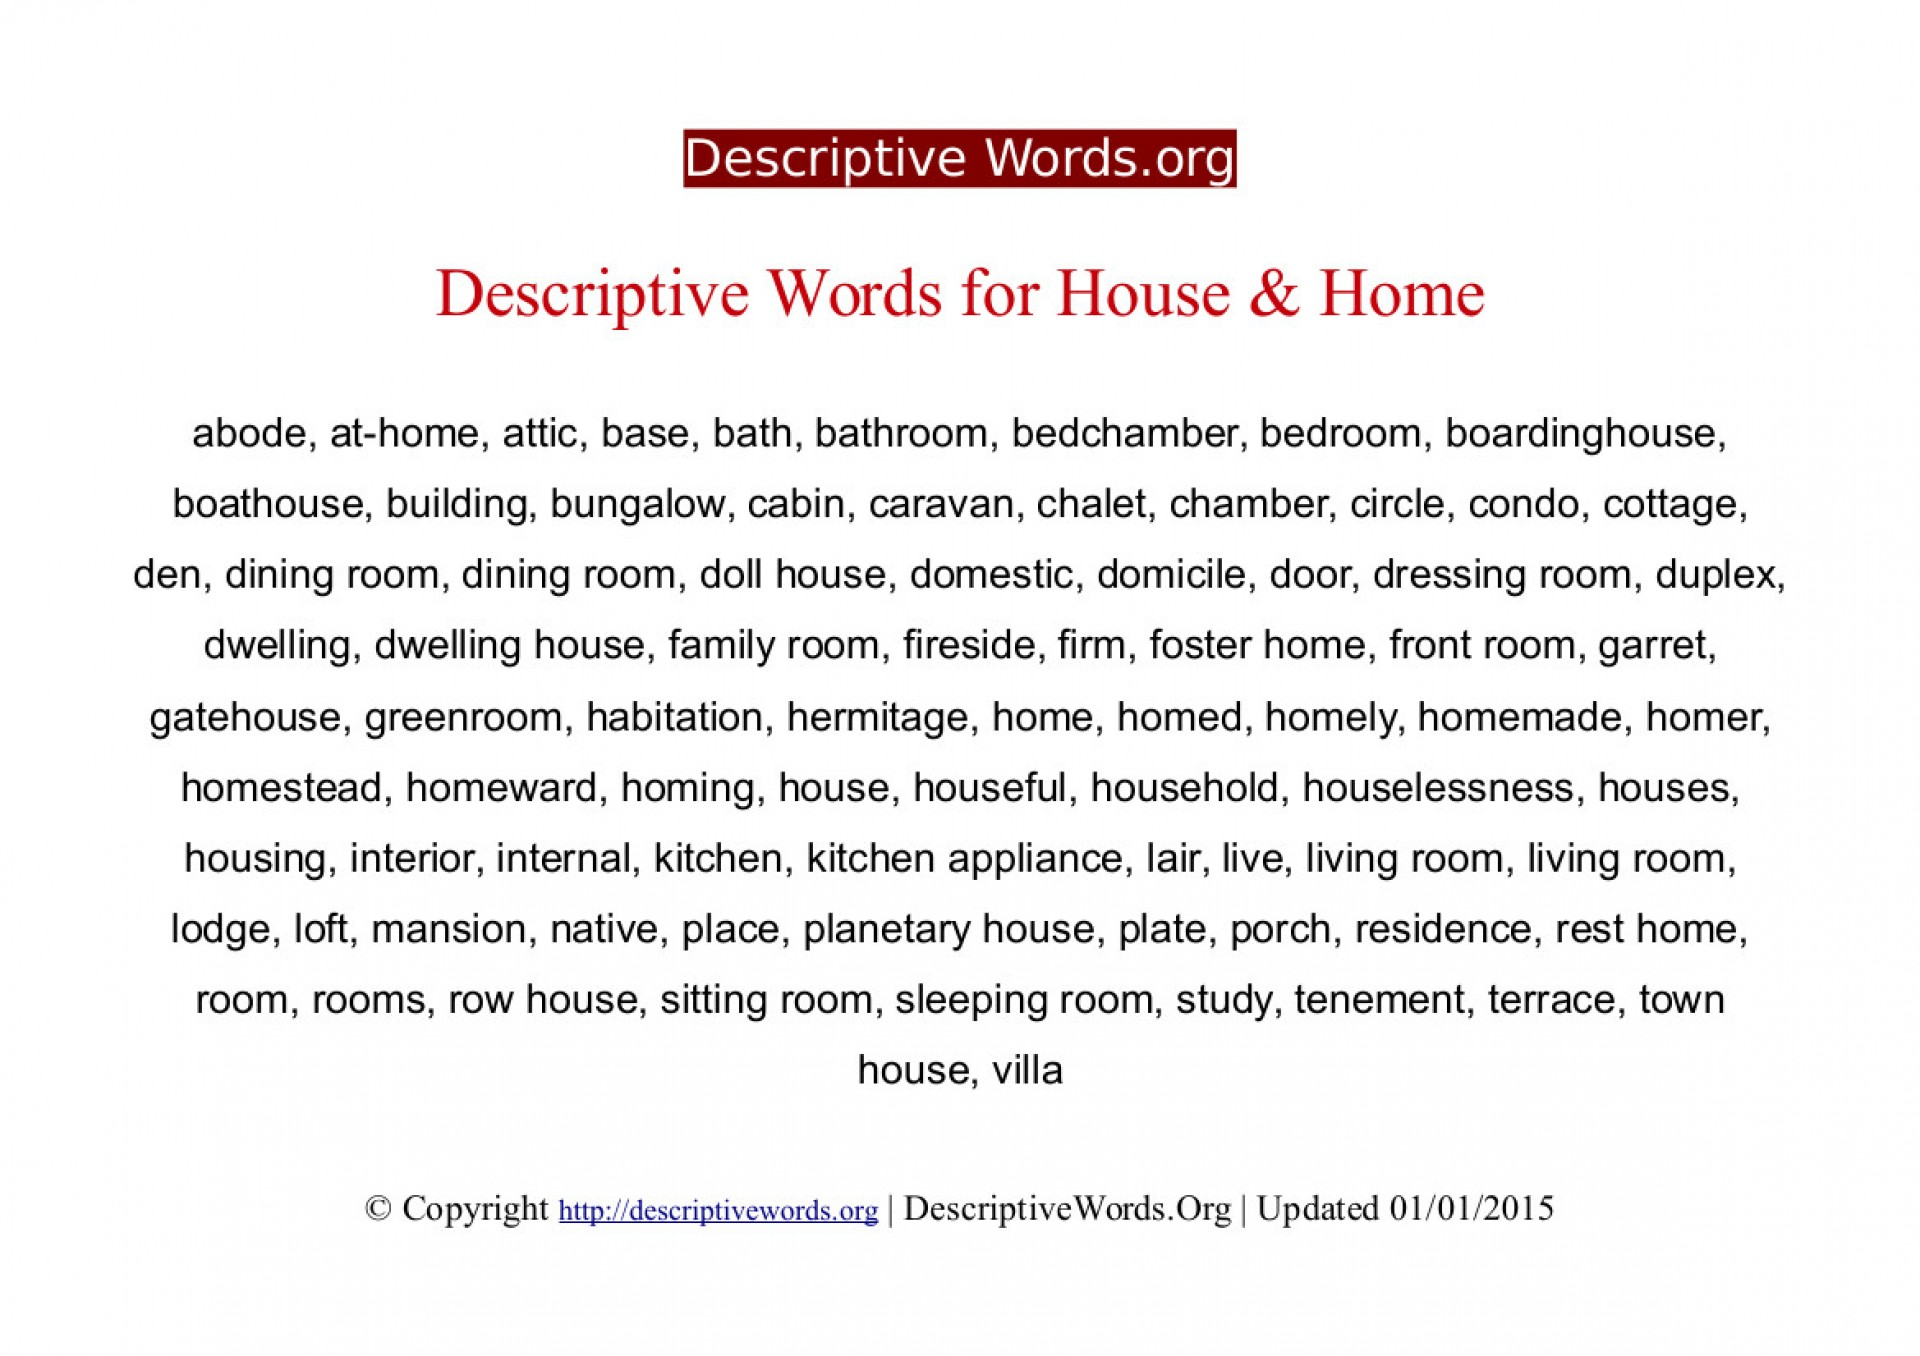 002 Descriptivewords For Home Descriptive Essay Beautiful Ideal My Town 1920